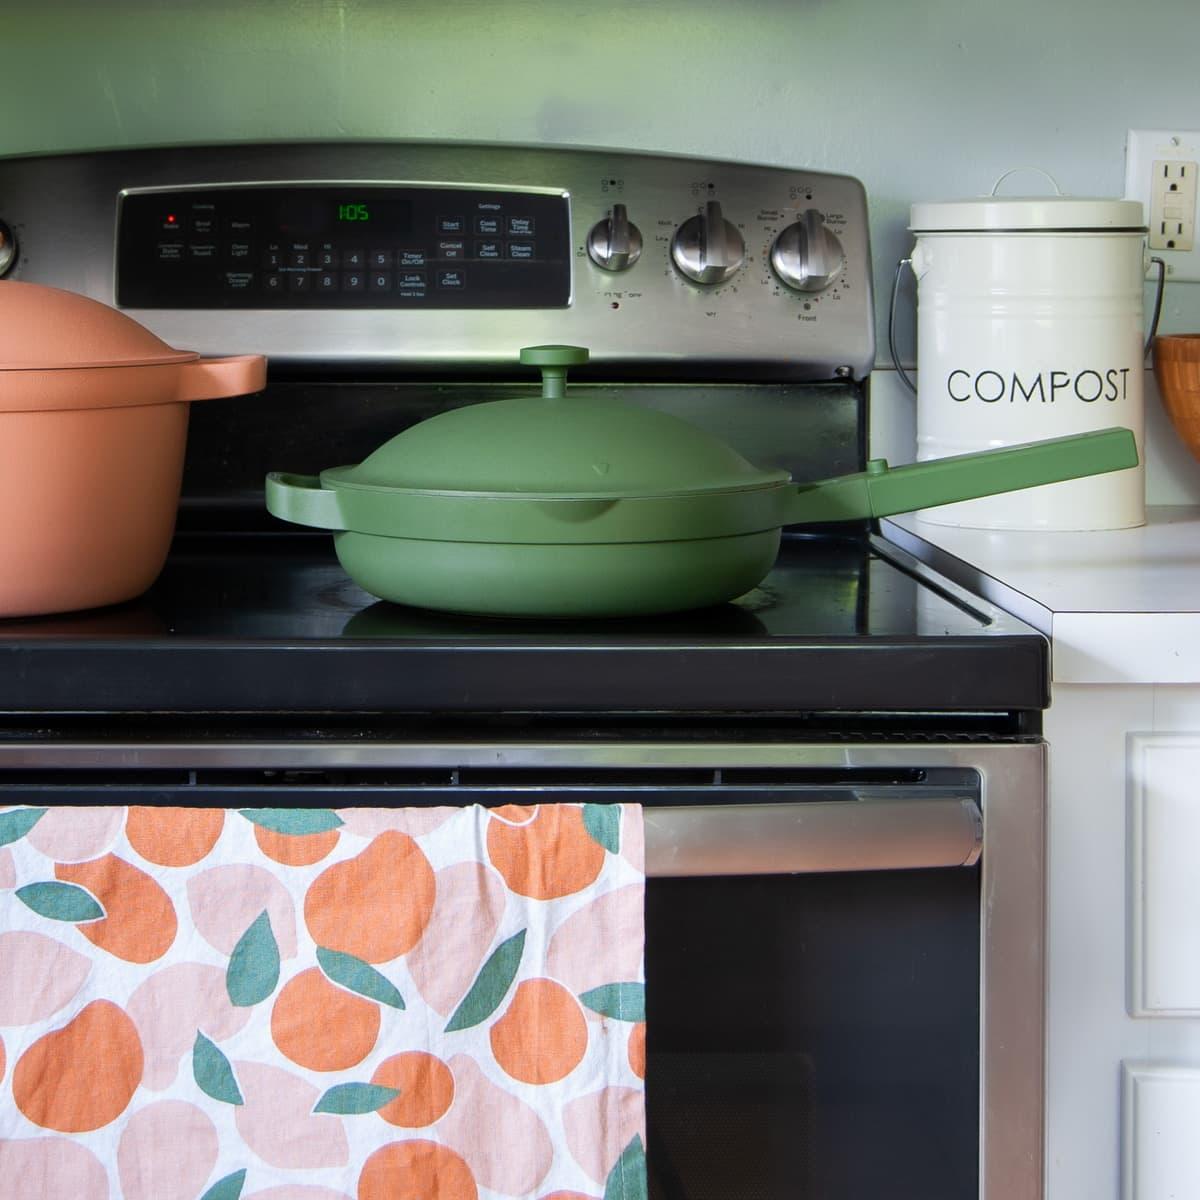 Get a Countertop Compost Pail